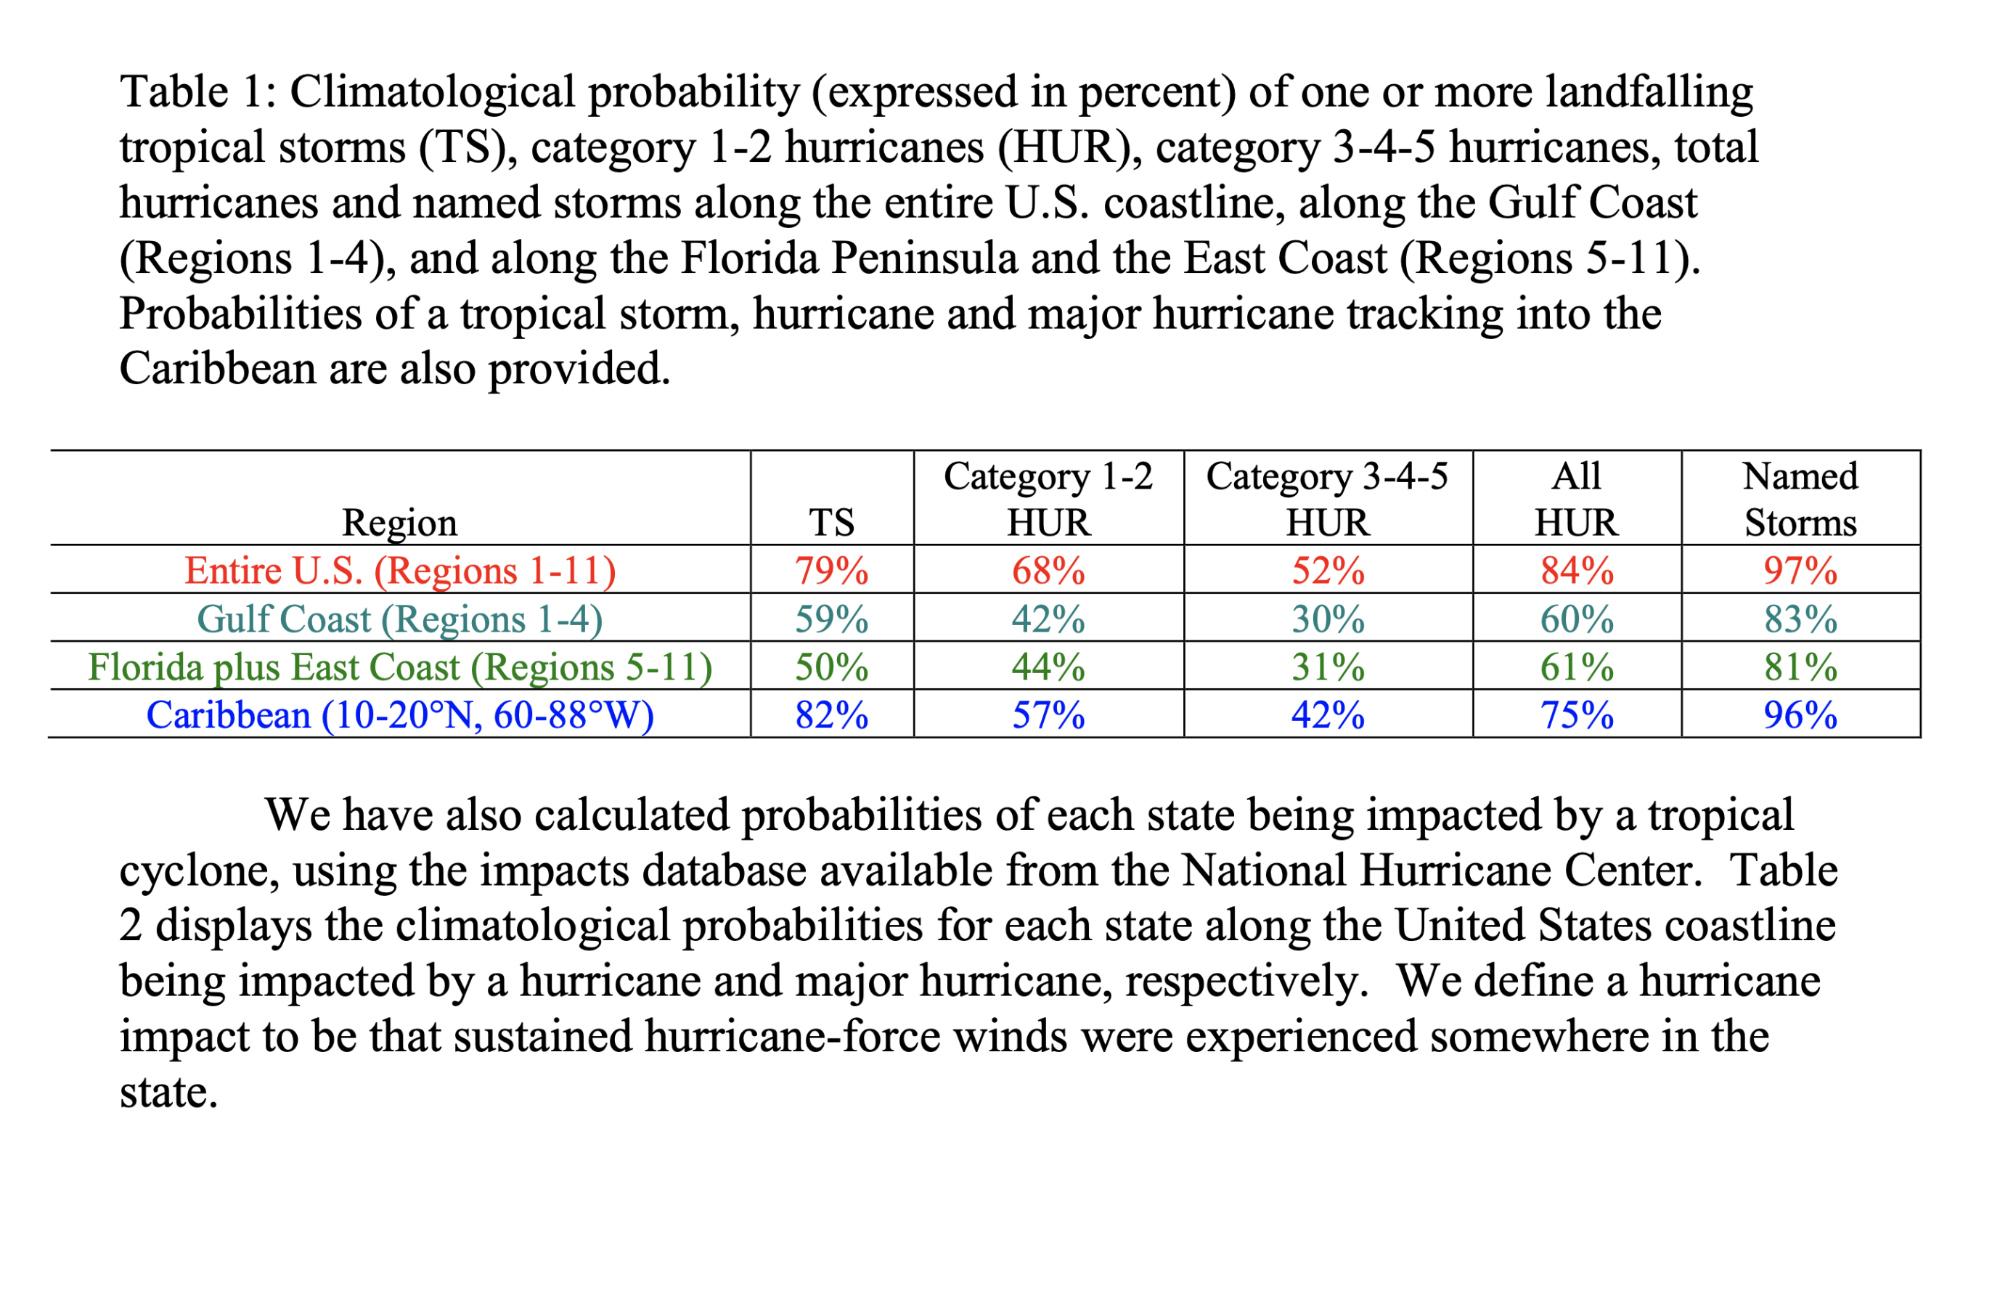 hurricane season 2020 gulf of mexico